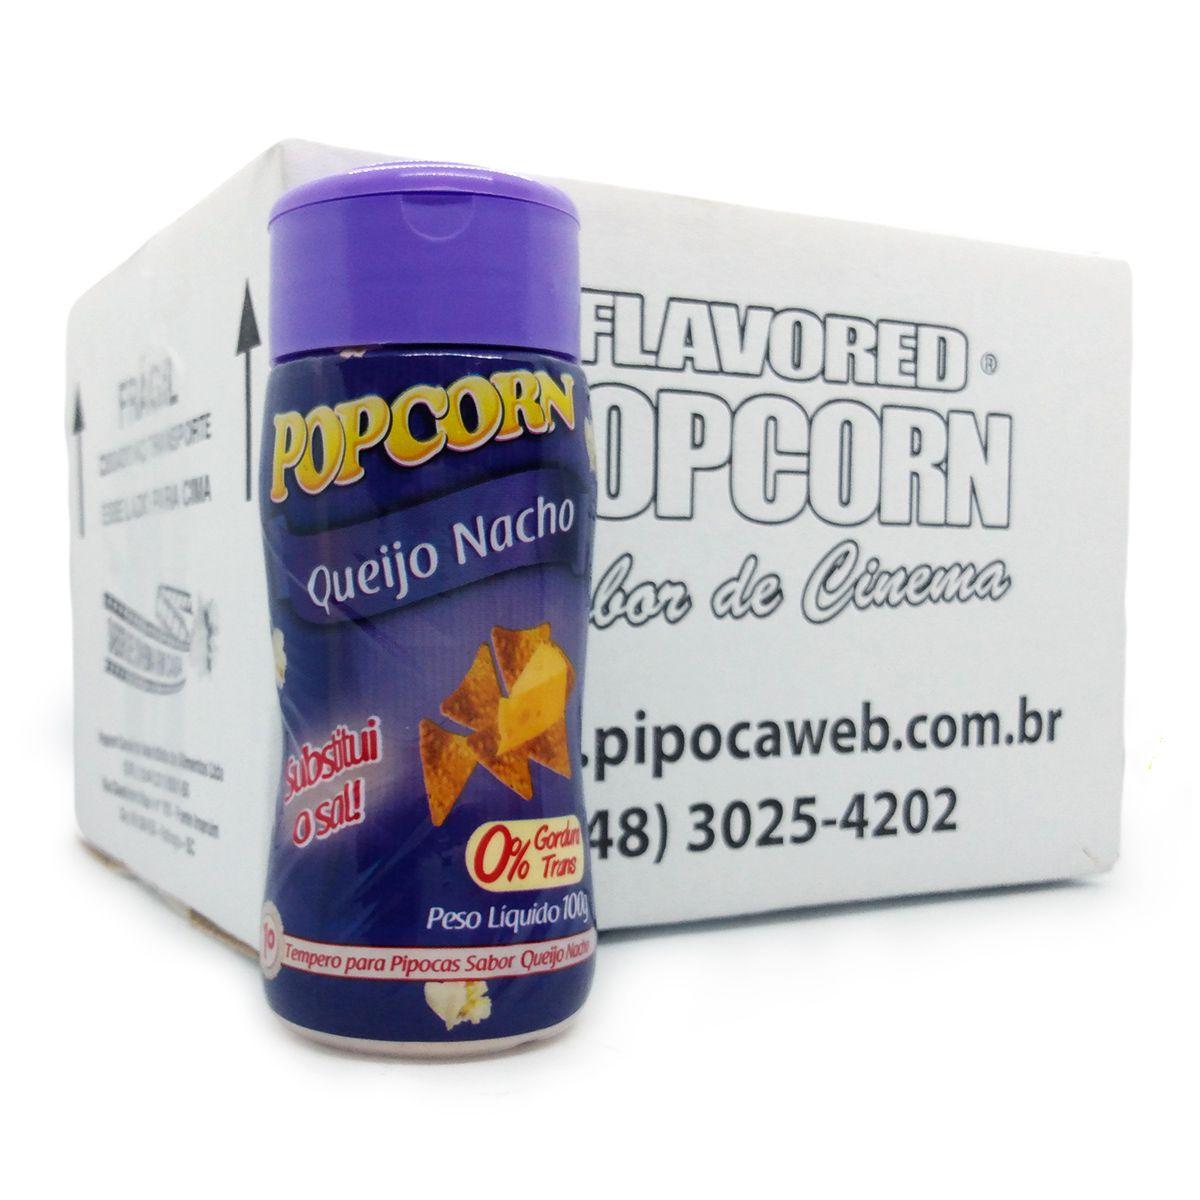 TEMPEROS P/ PIPOCA - SABOR QUEIJO NACHO 100g - Caixa c/ 12 Un - R$ 7,66 cada